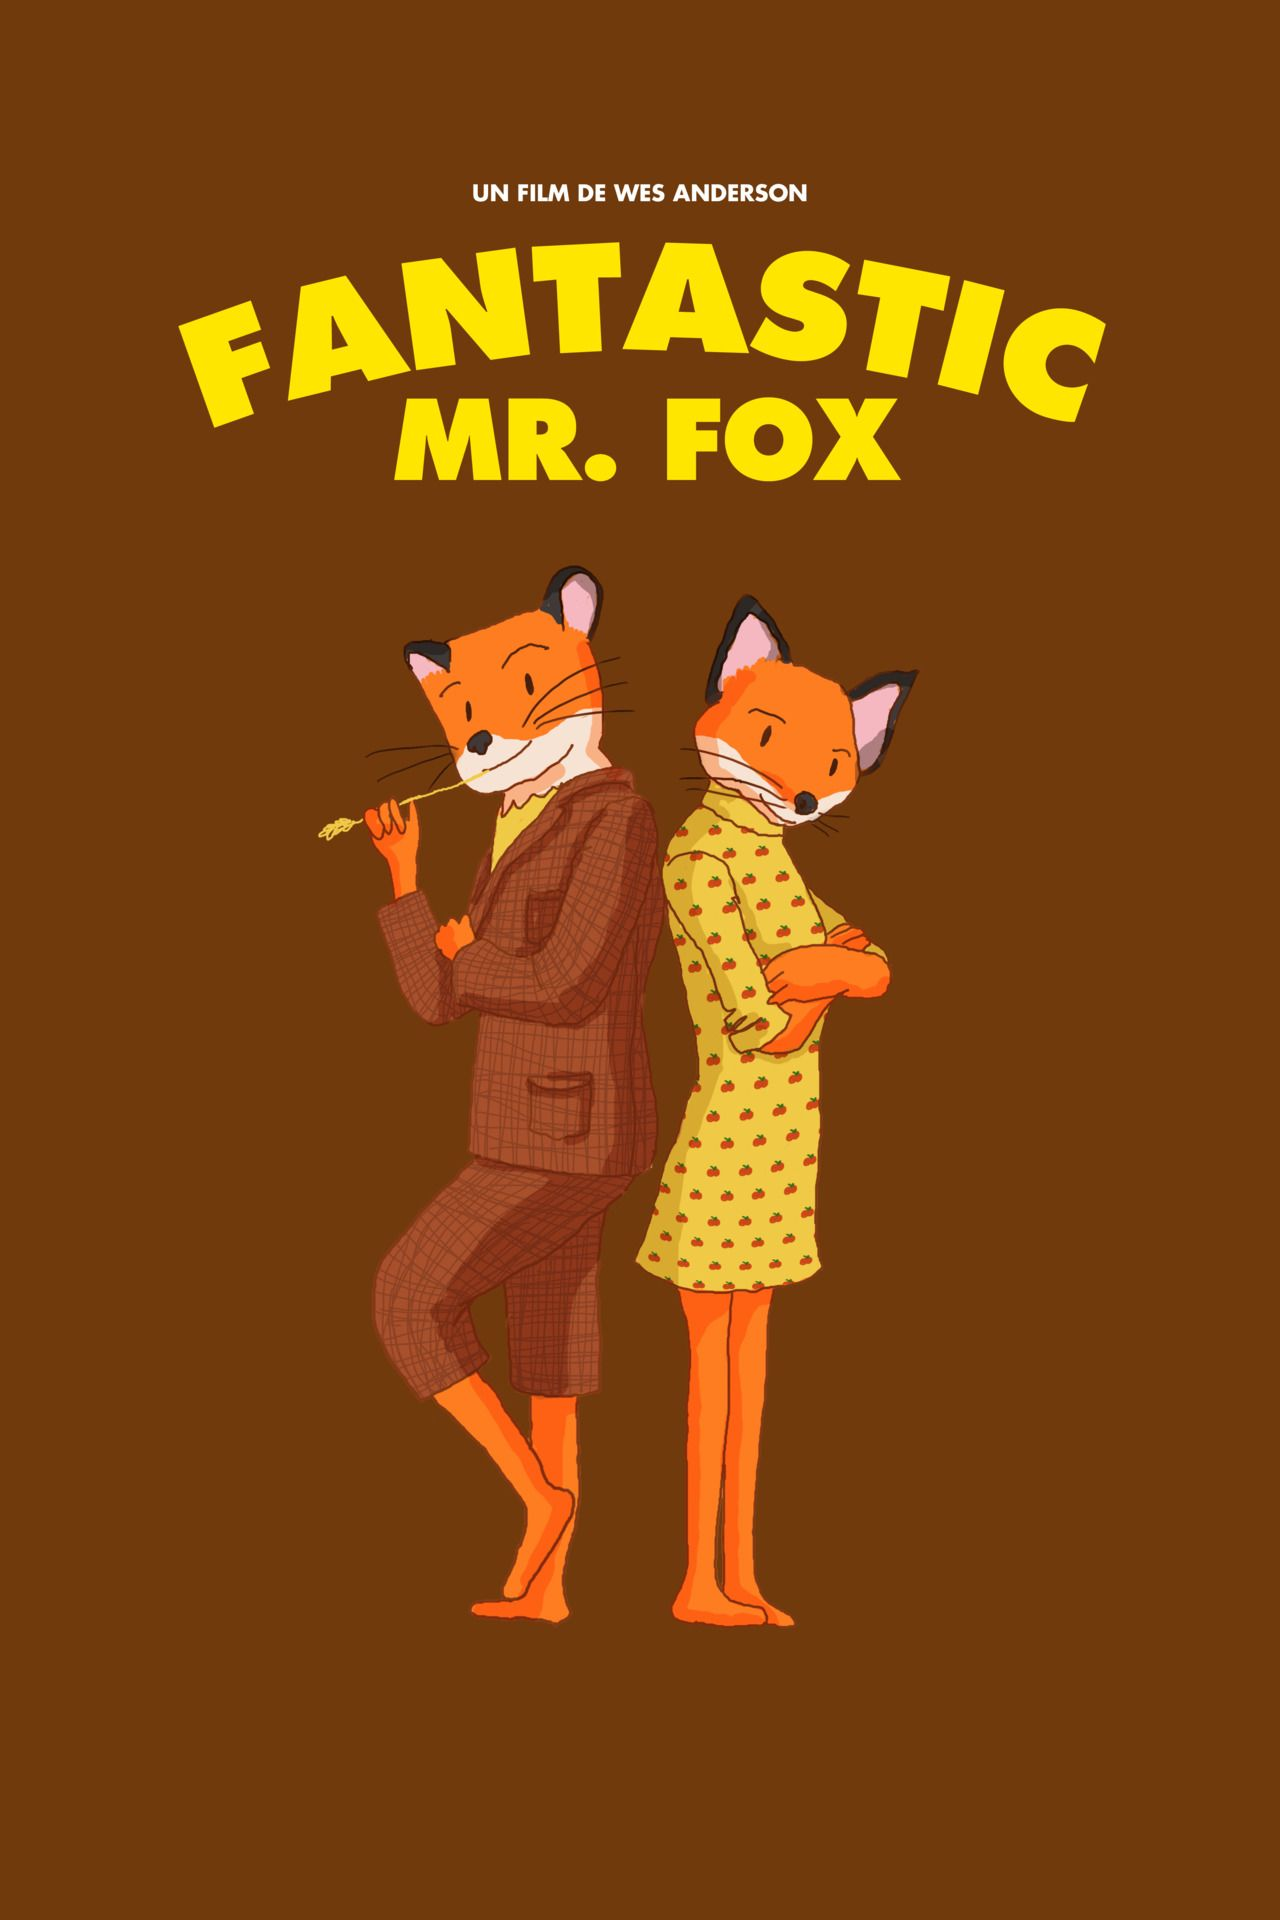 fantastic mr fox movie photo print